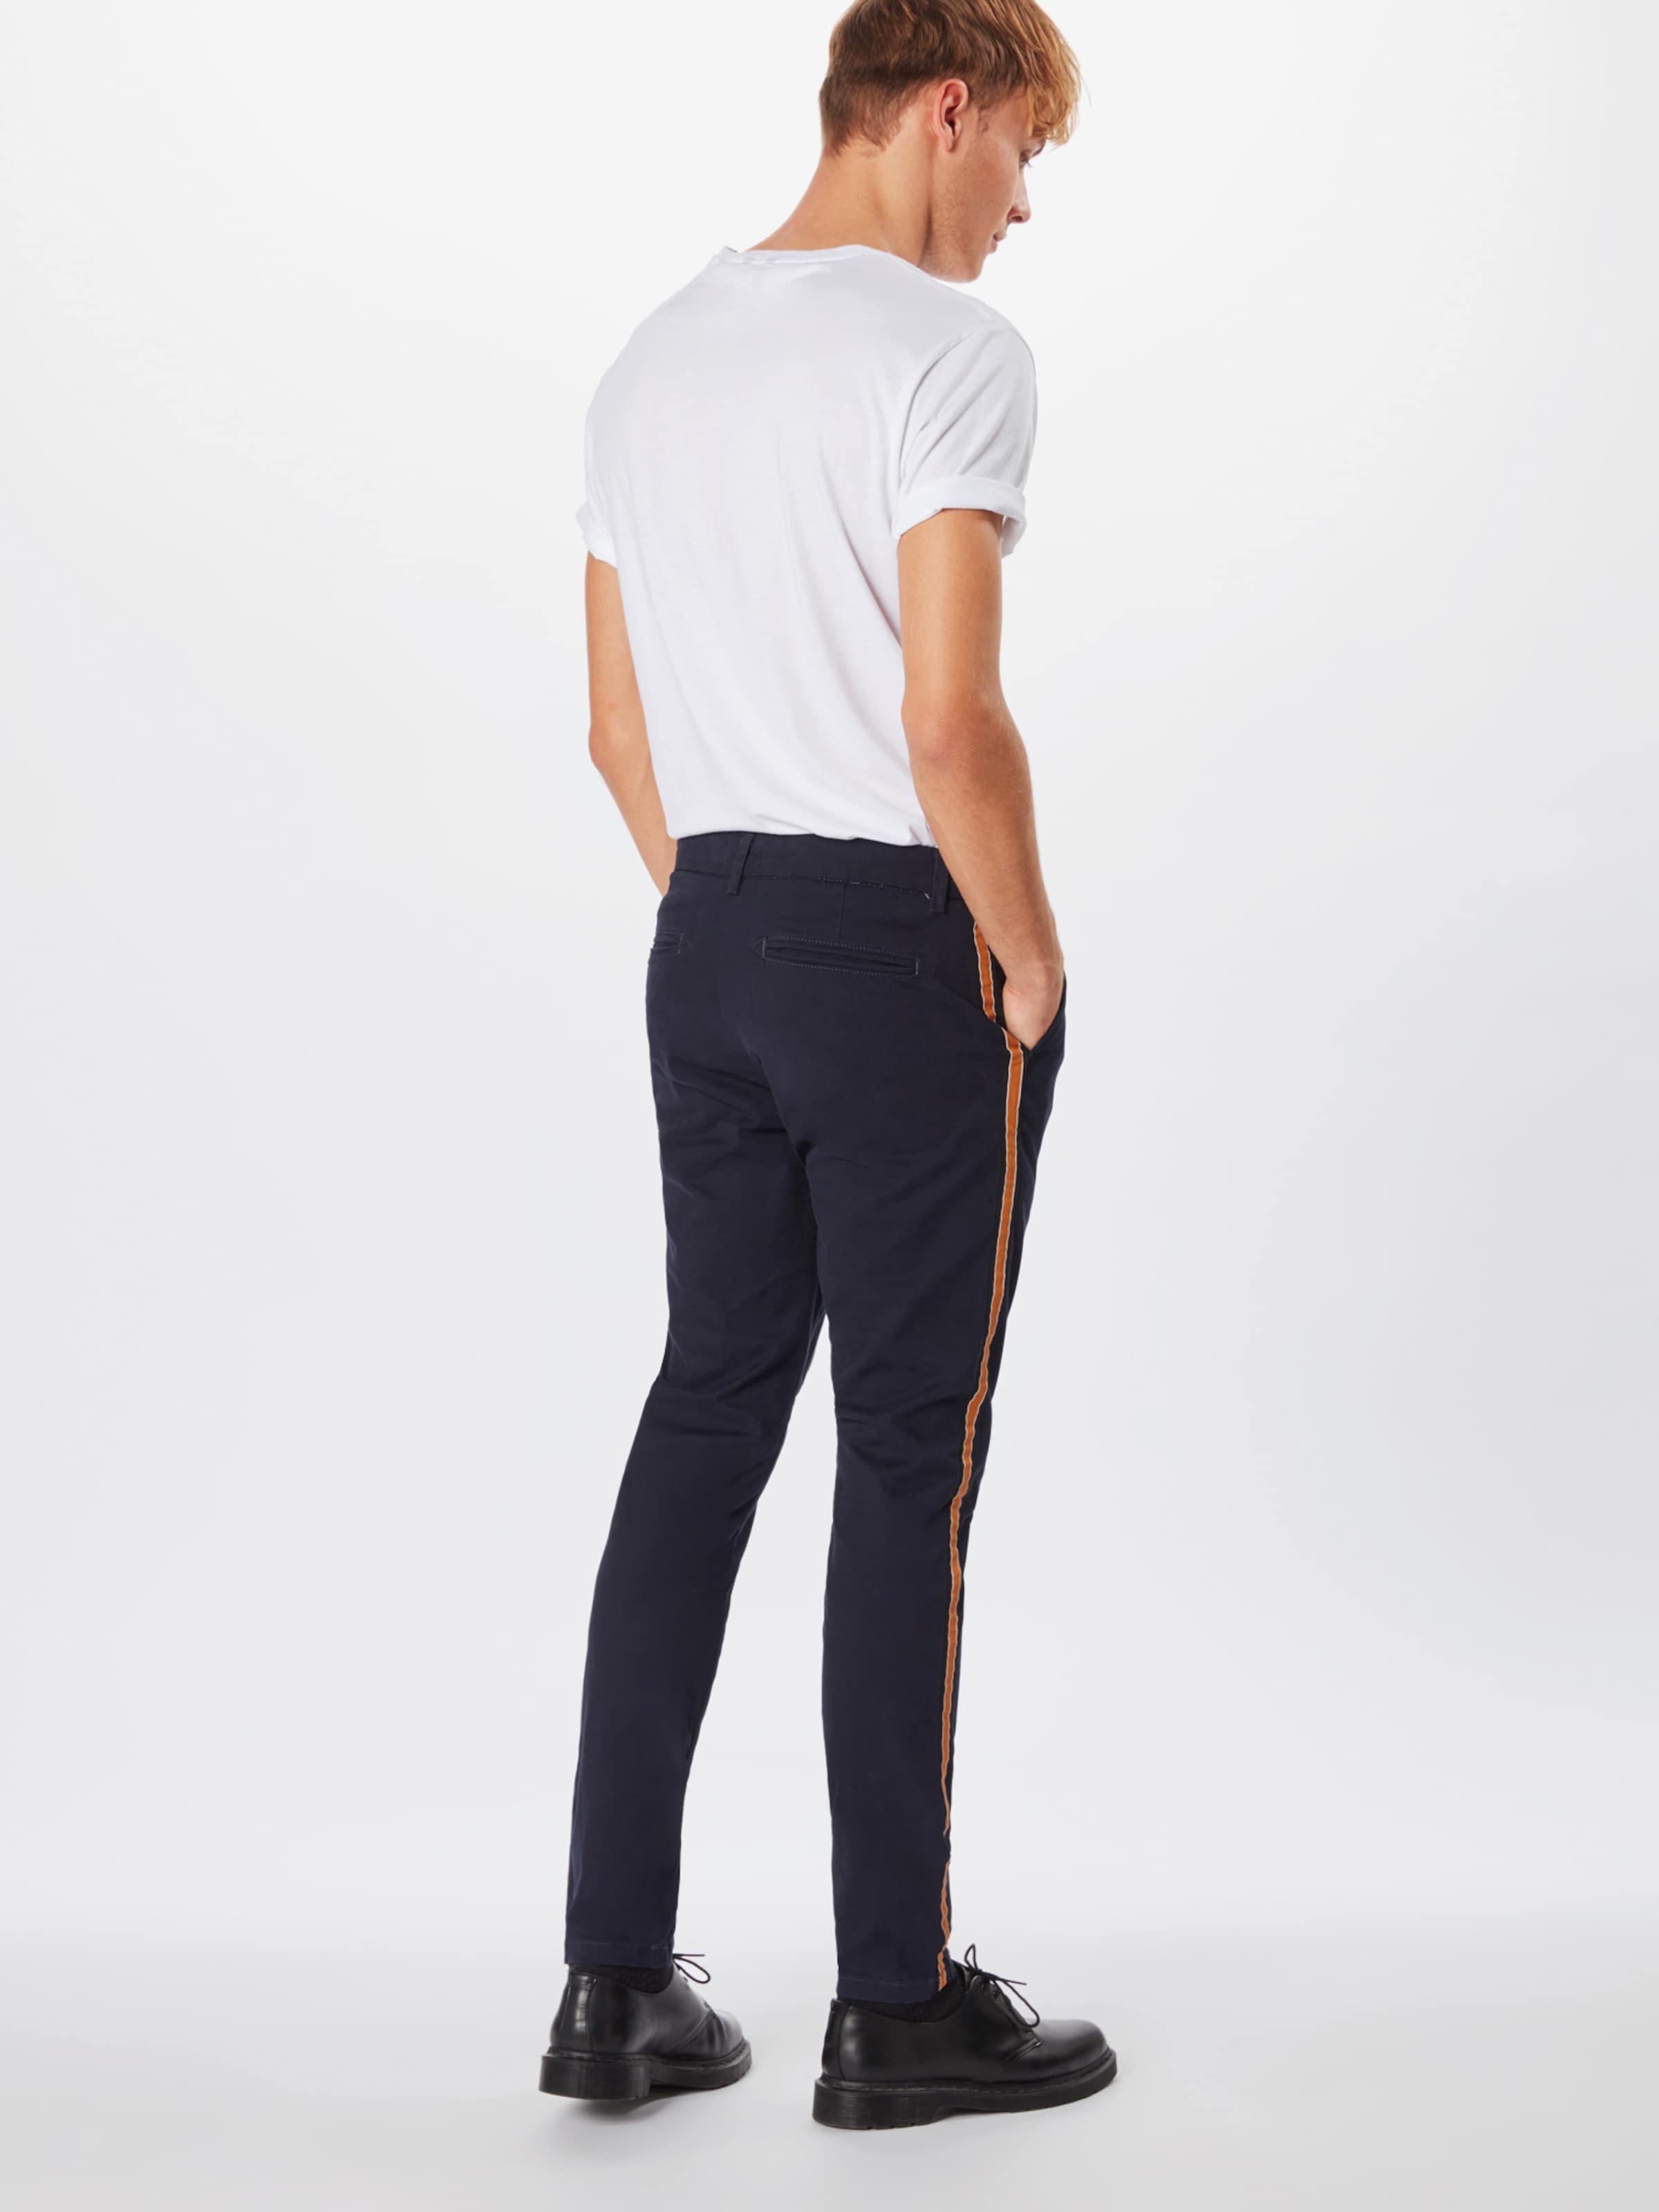 18 Side Look Chino Navy En 'rpaso Bleu Pantalon 04 Stripe' MarineOrange New 06 34LqRA5j